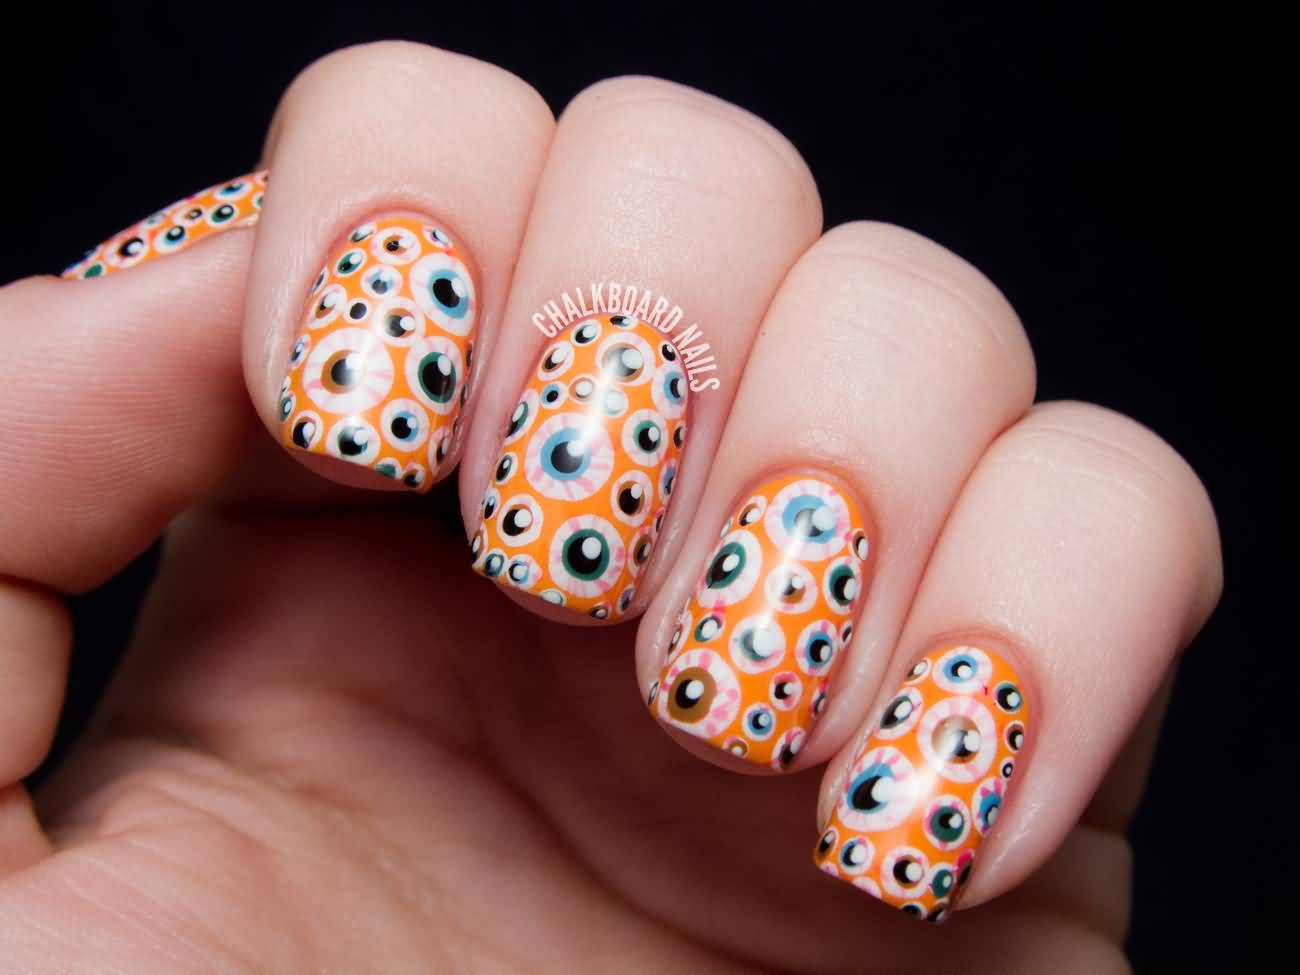 Eyeballs halloween nail art design prinsesfo Images